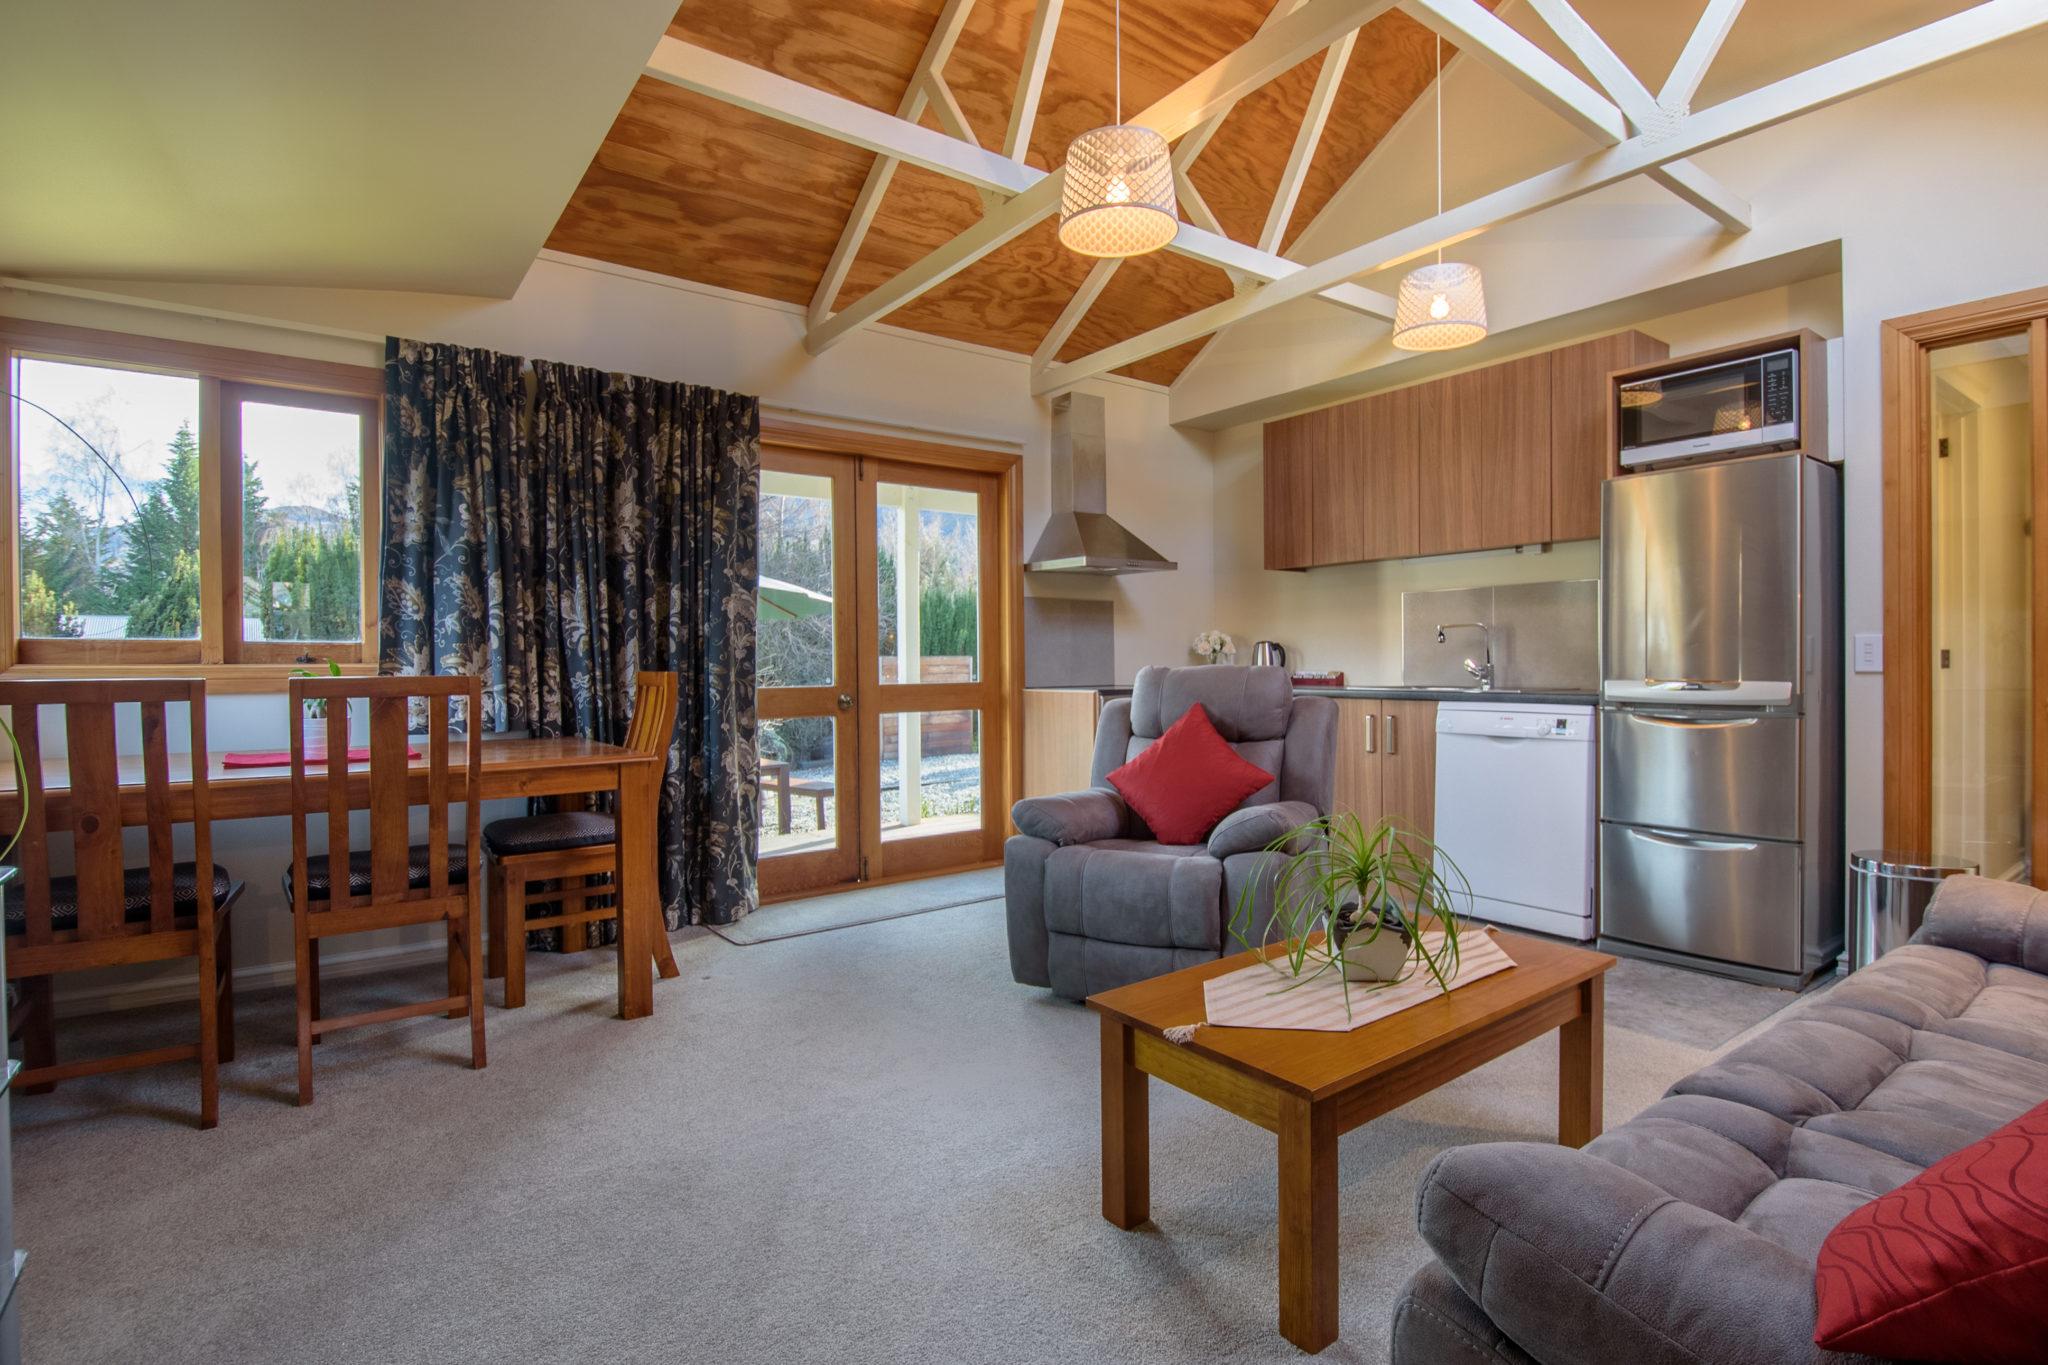 2 Bedroom Apartment at Coronet Peak in New Zealand